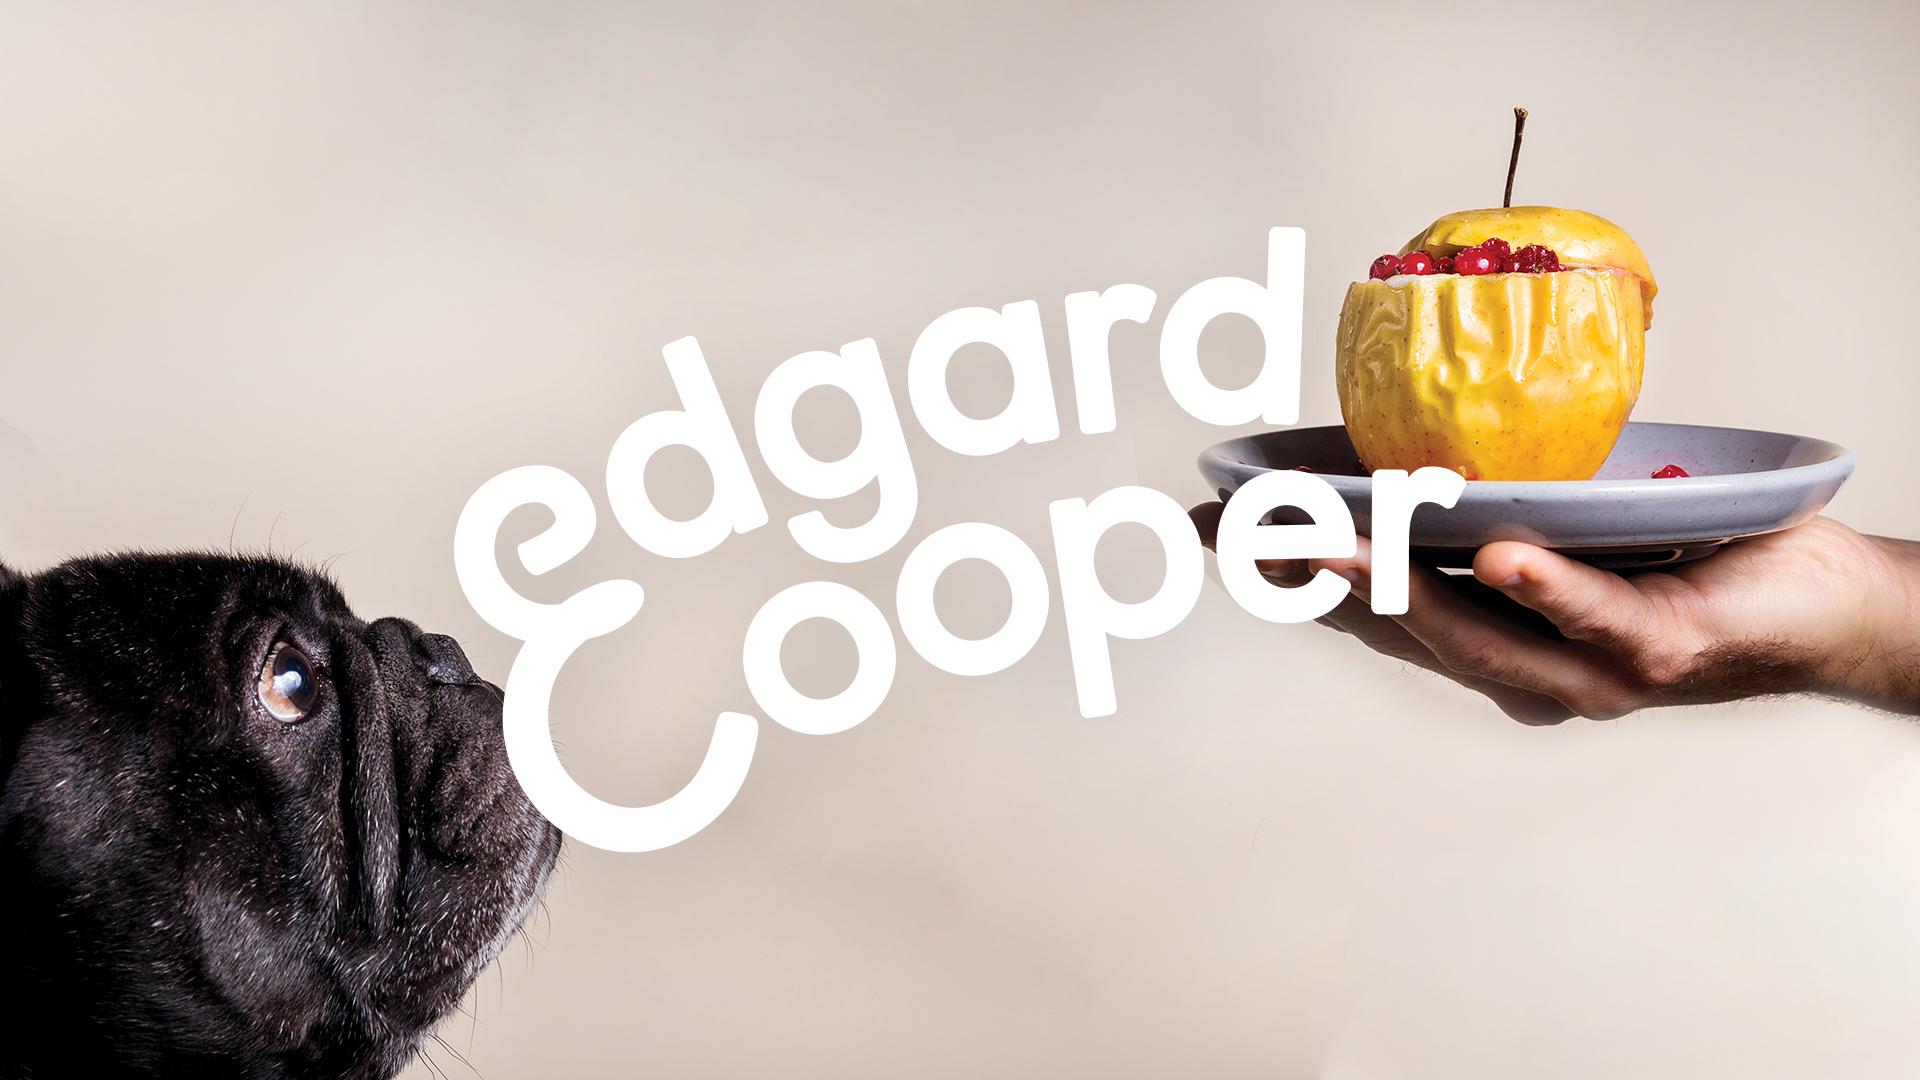 Edgar & Cooper